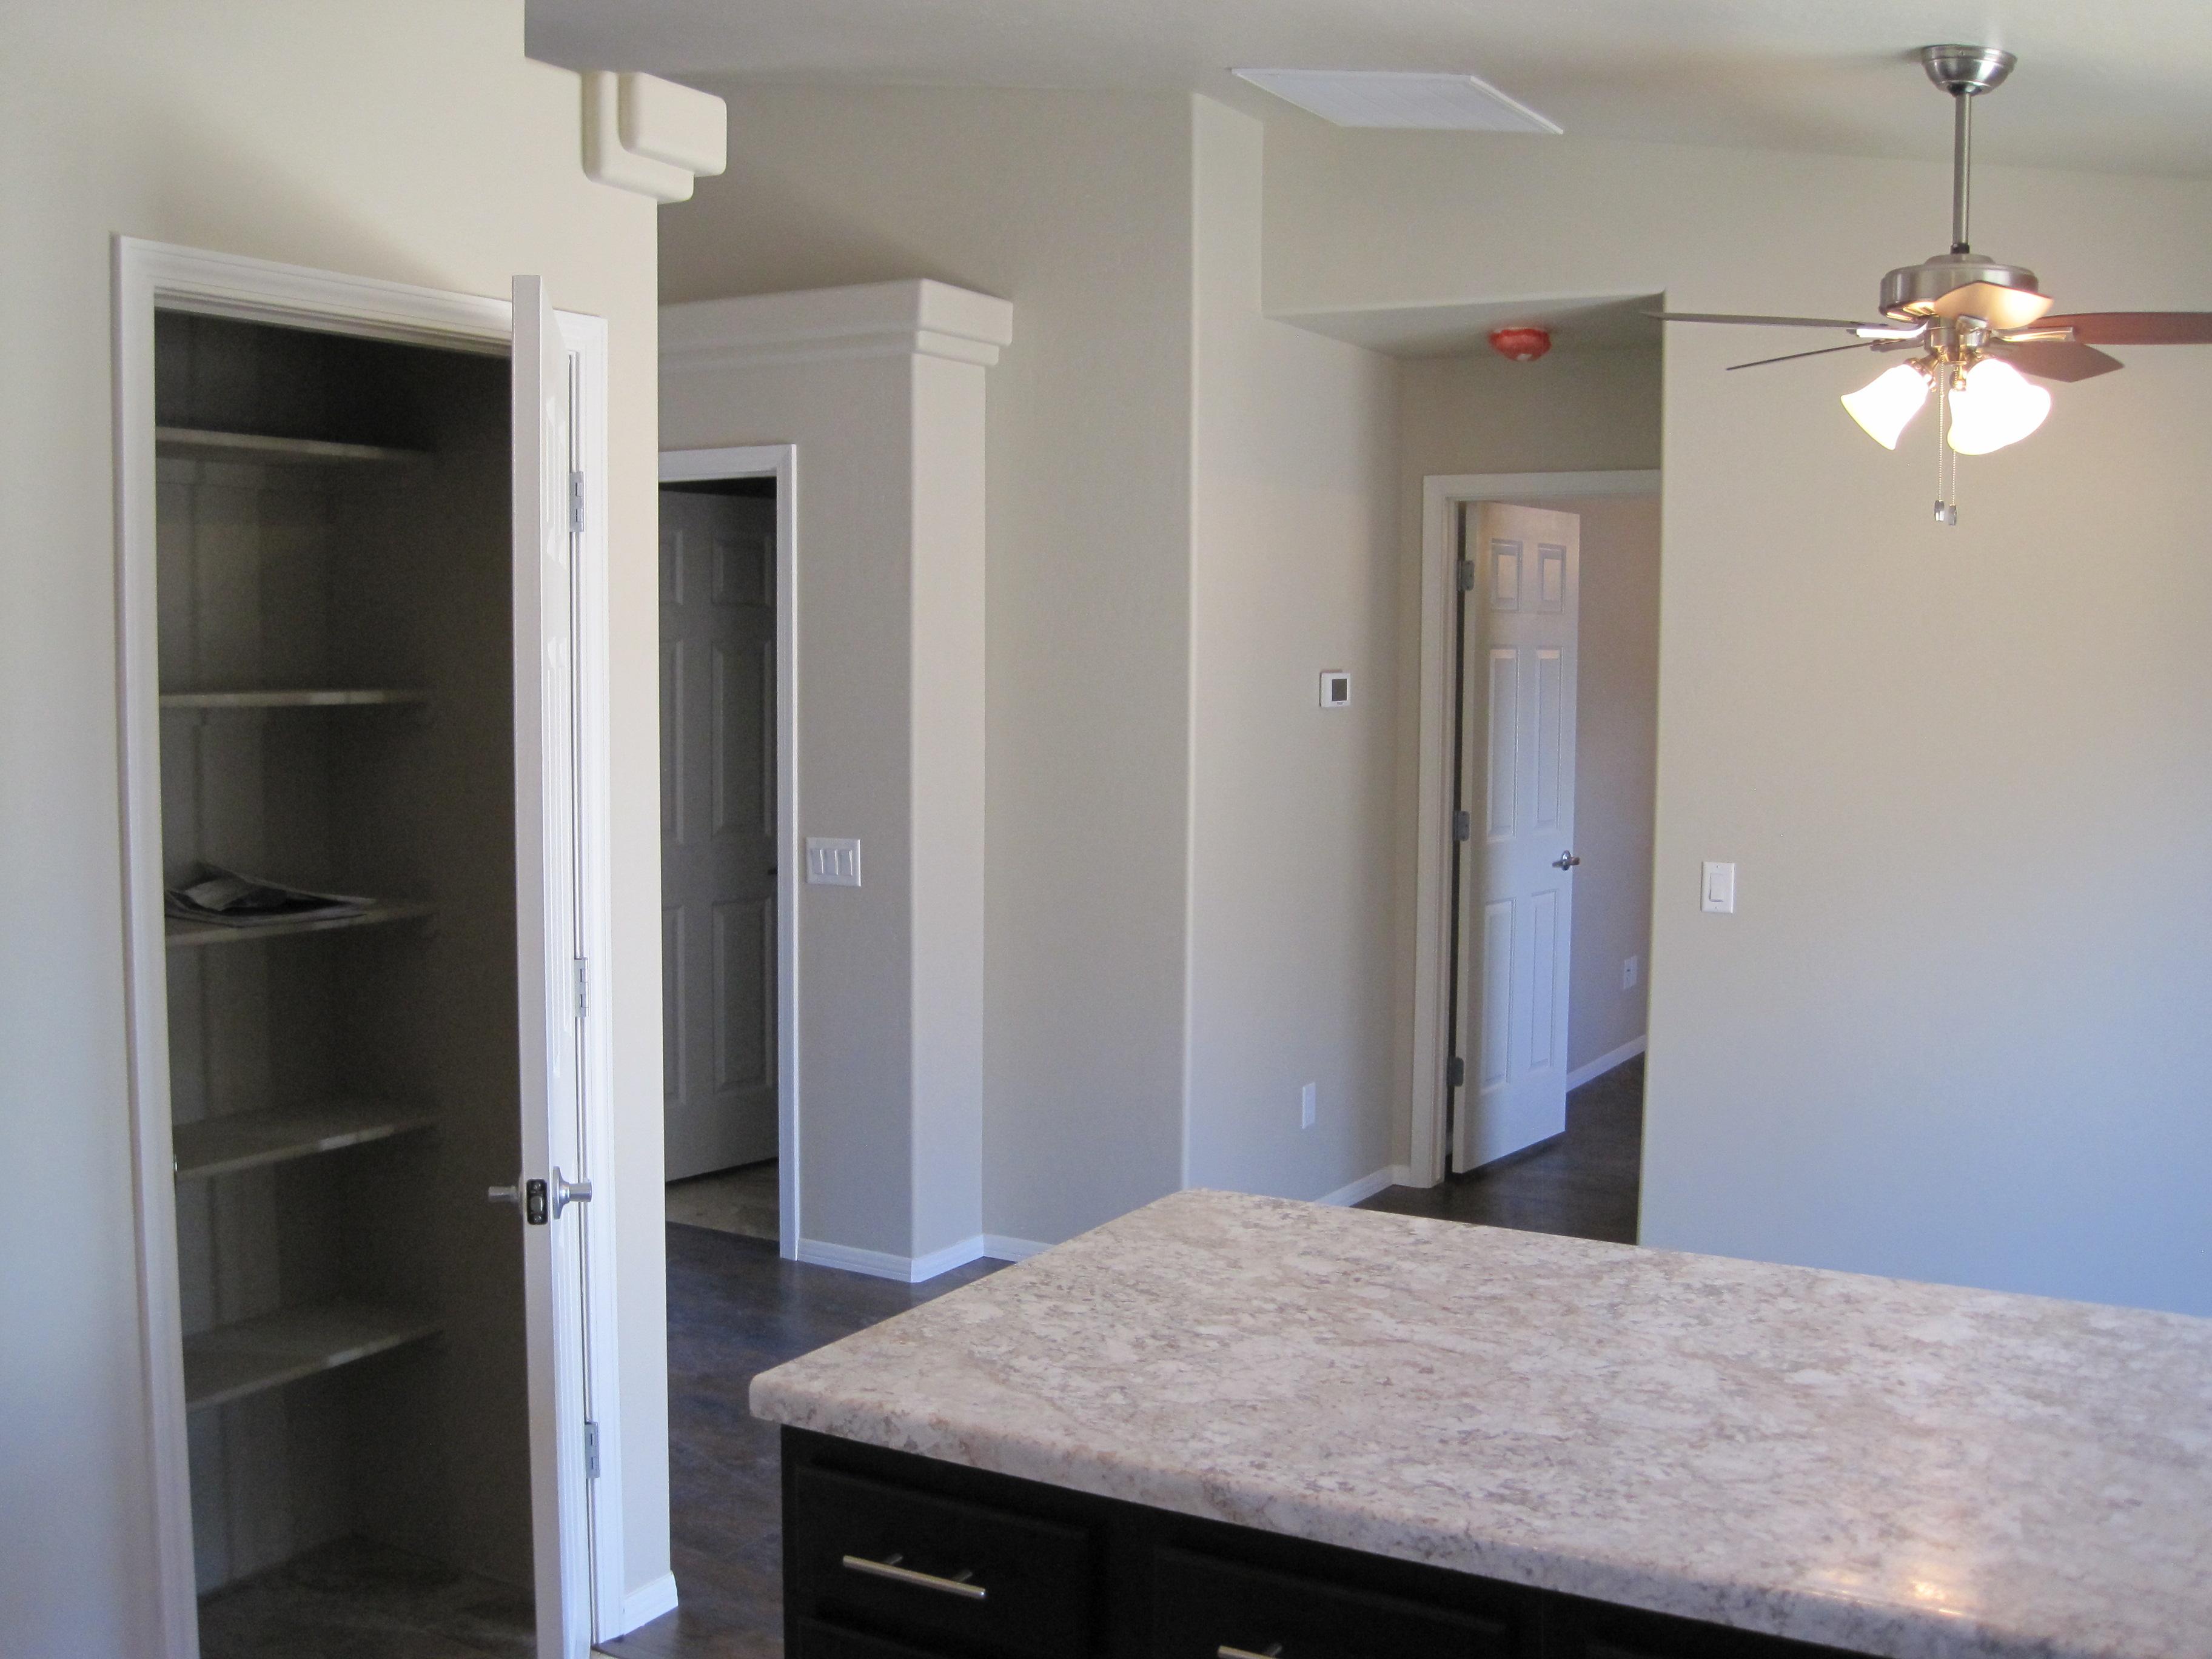 2 Bedroom 2 Bathroom Apartments for rent in Cottonwood, AZ